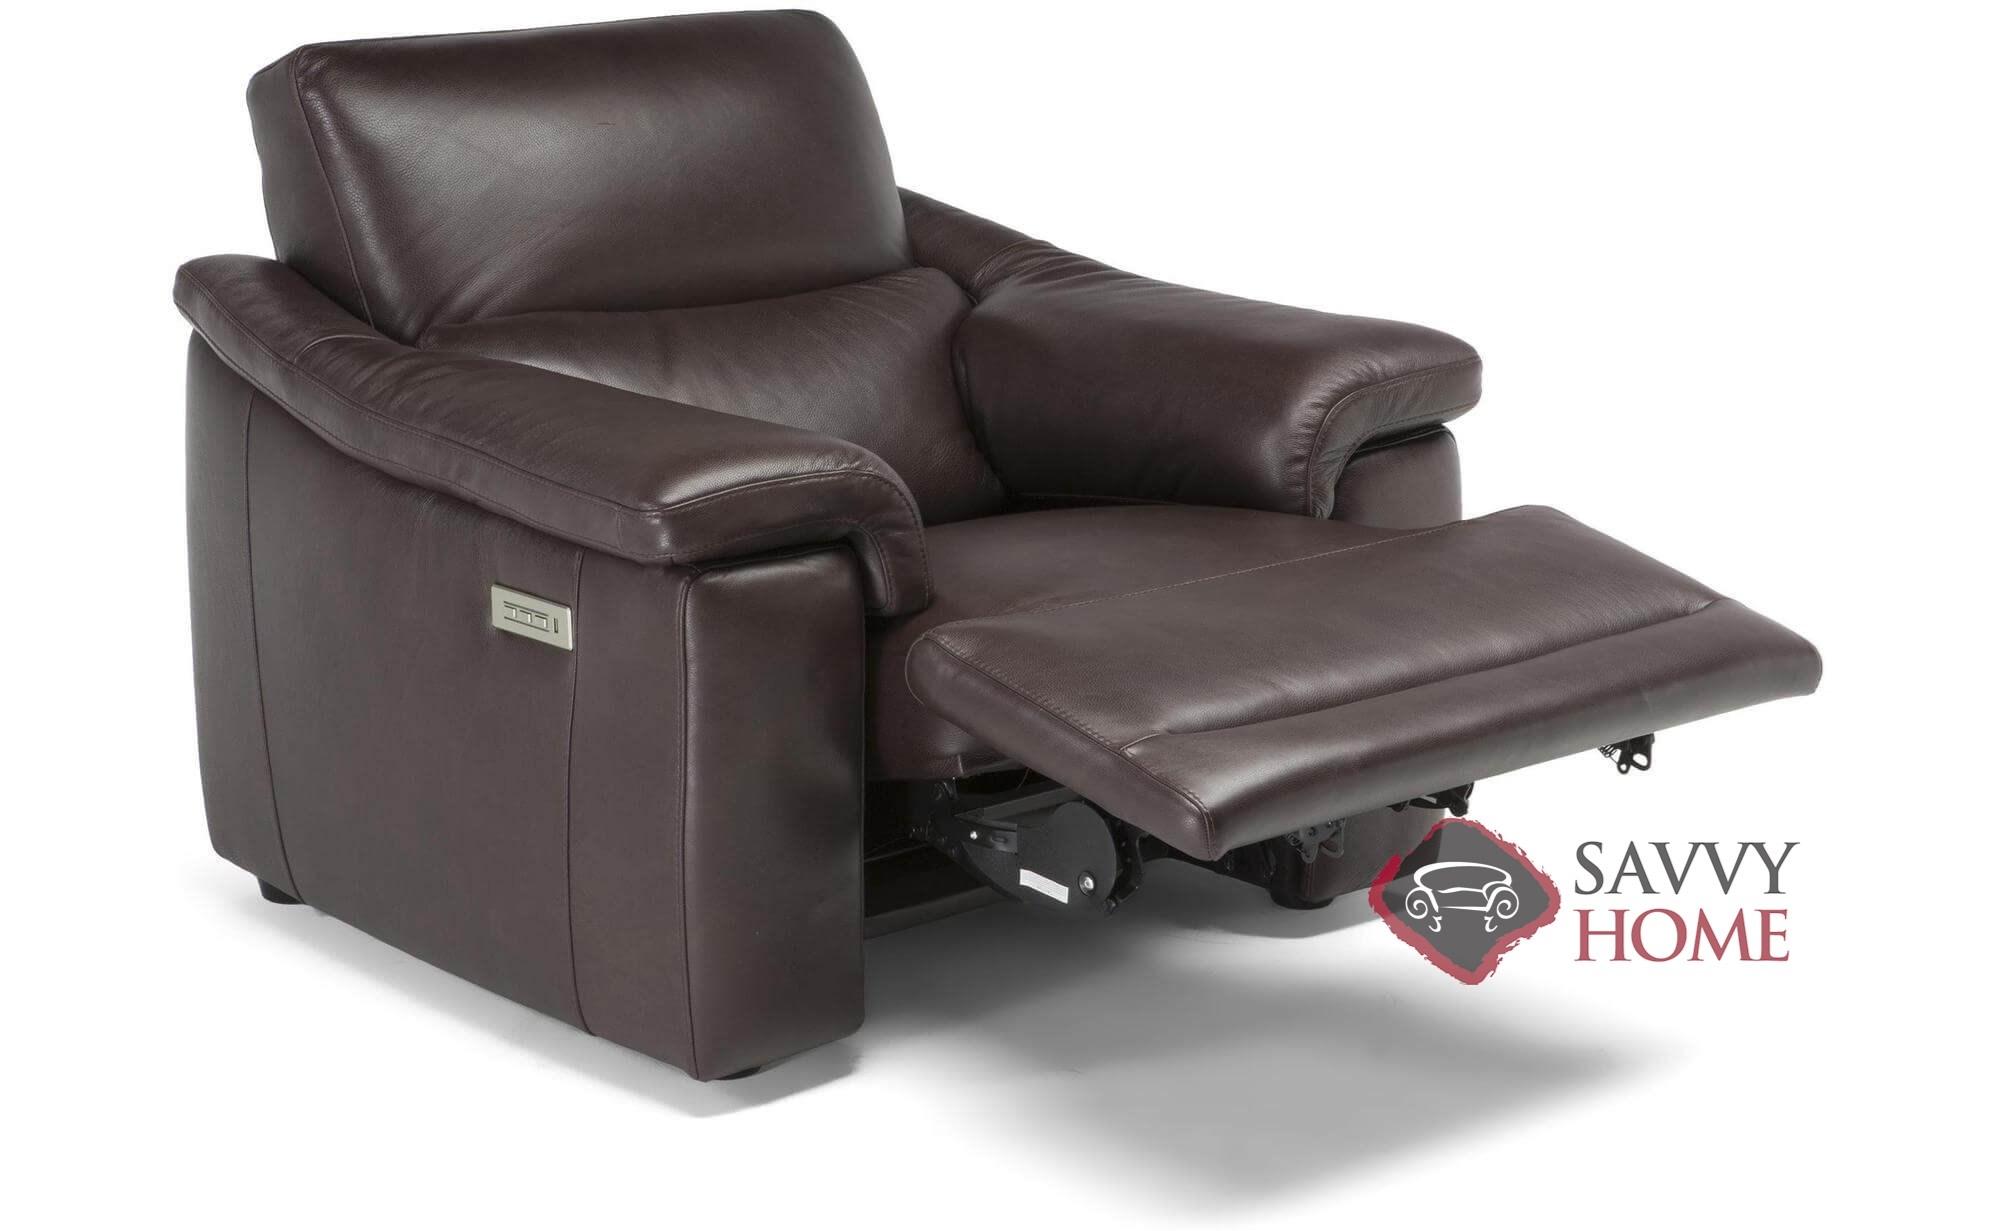 Brama C070 N54 Leather Reclining Chair By Natuzzi